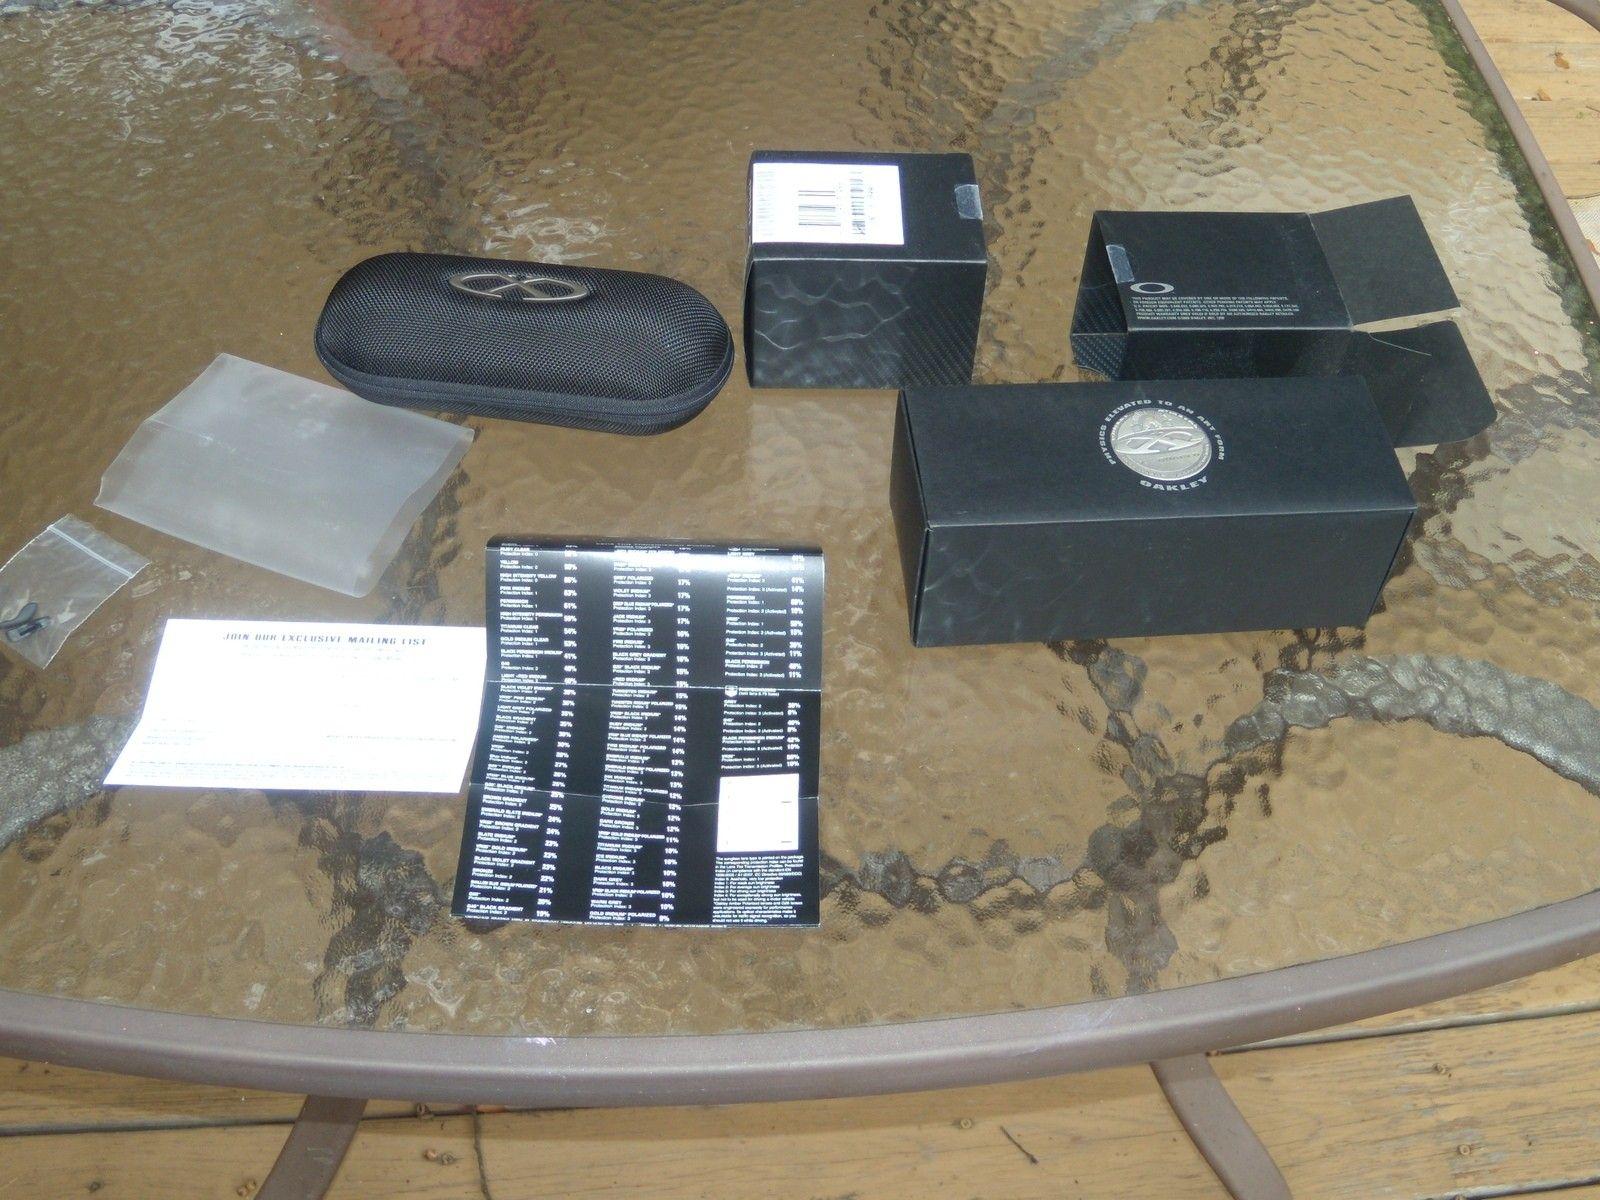 XX Squared Polished Carbon w/ Black Iridium Polarized lenses mint condition $450 obo - DSCN5988.JPG